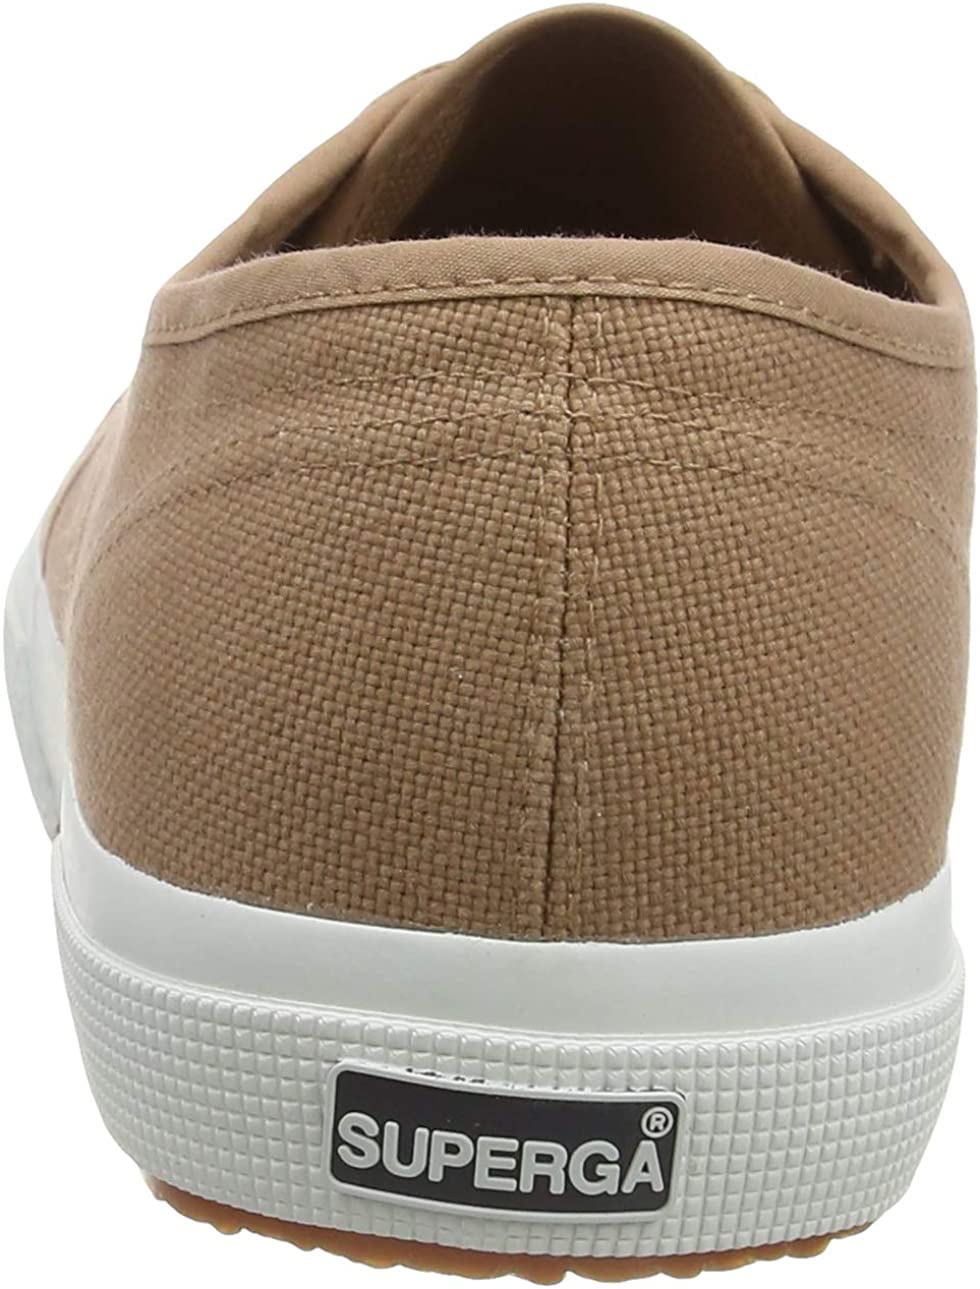 Superga Men's Low-Top Gymnastics Shoes Brown Brown Dusty Wg6